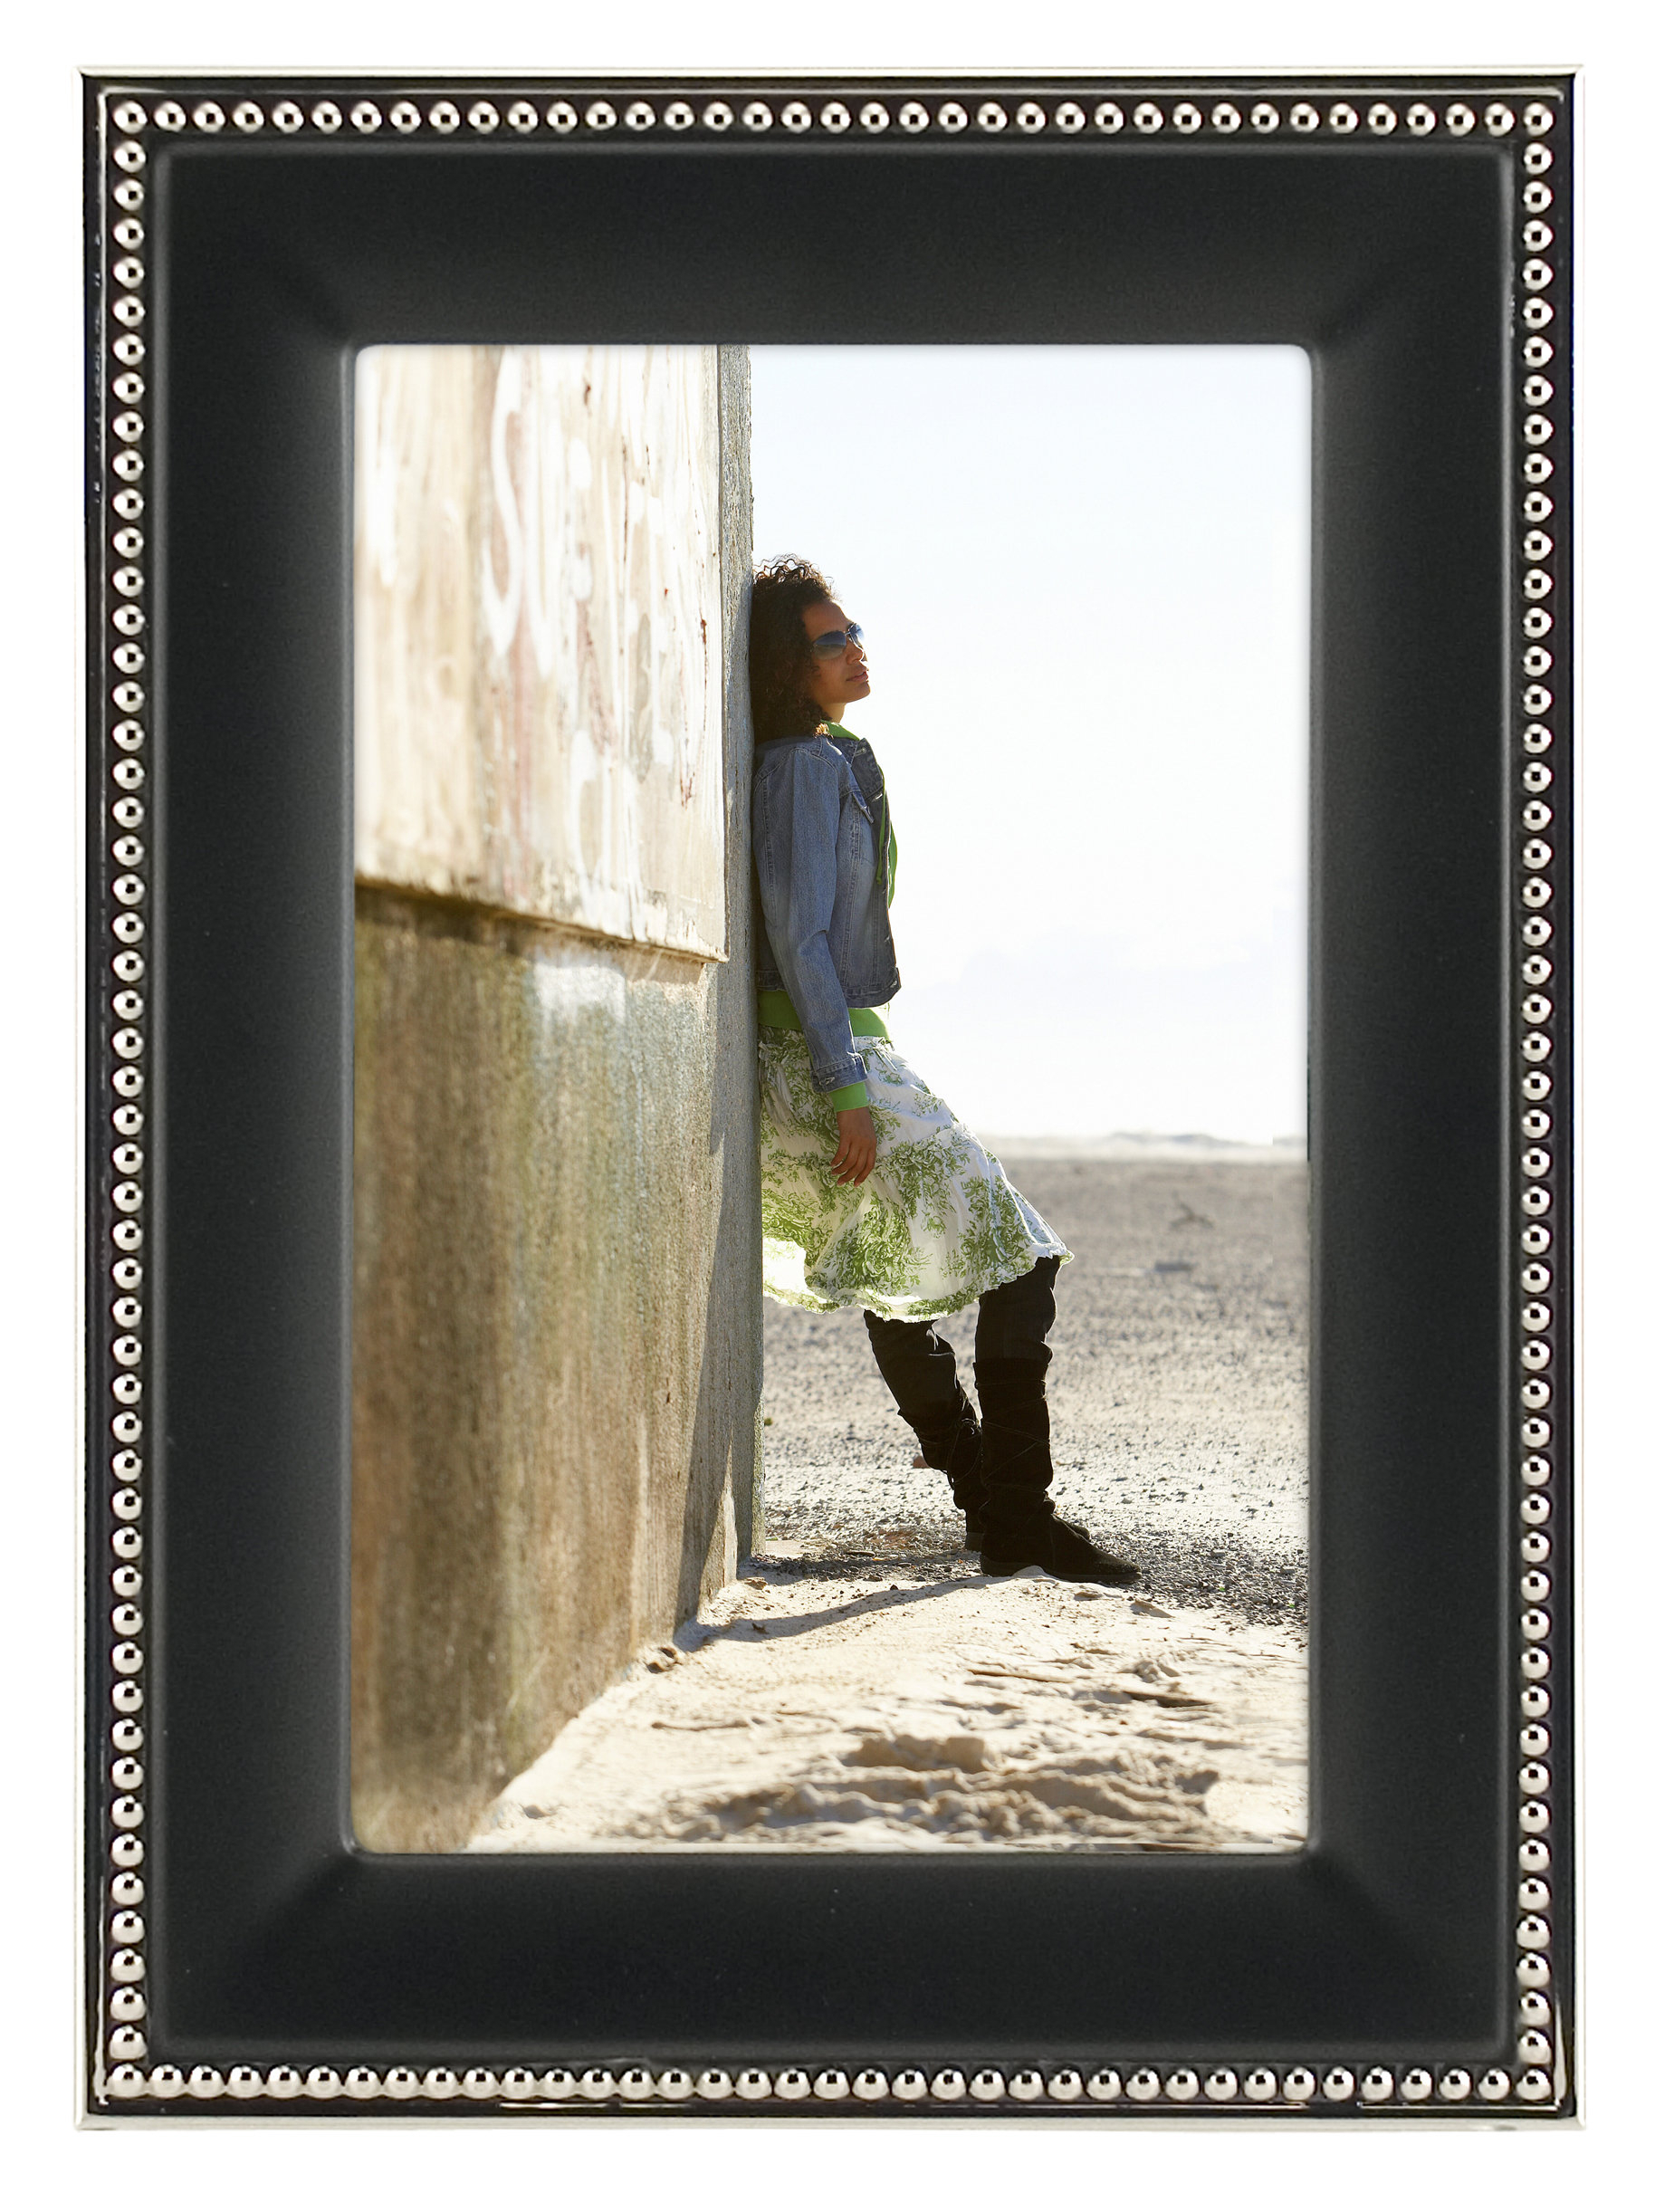 Black Picture Frames | Joss & Main Pertaining To Millanocket Metal Wheel Photo Holder Wall Decor (View 4 of 30)